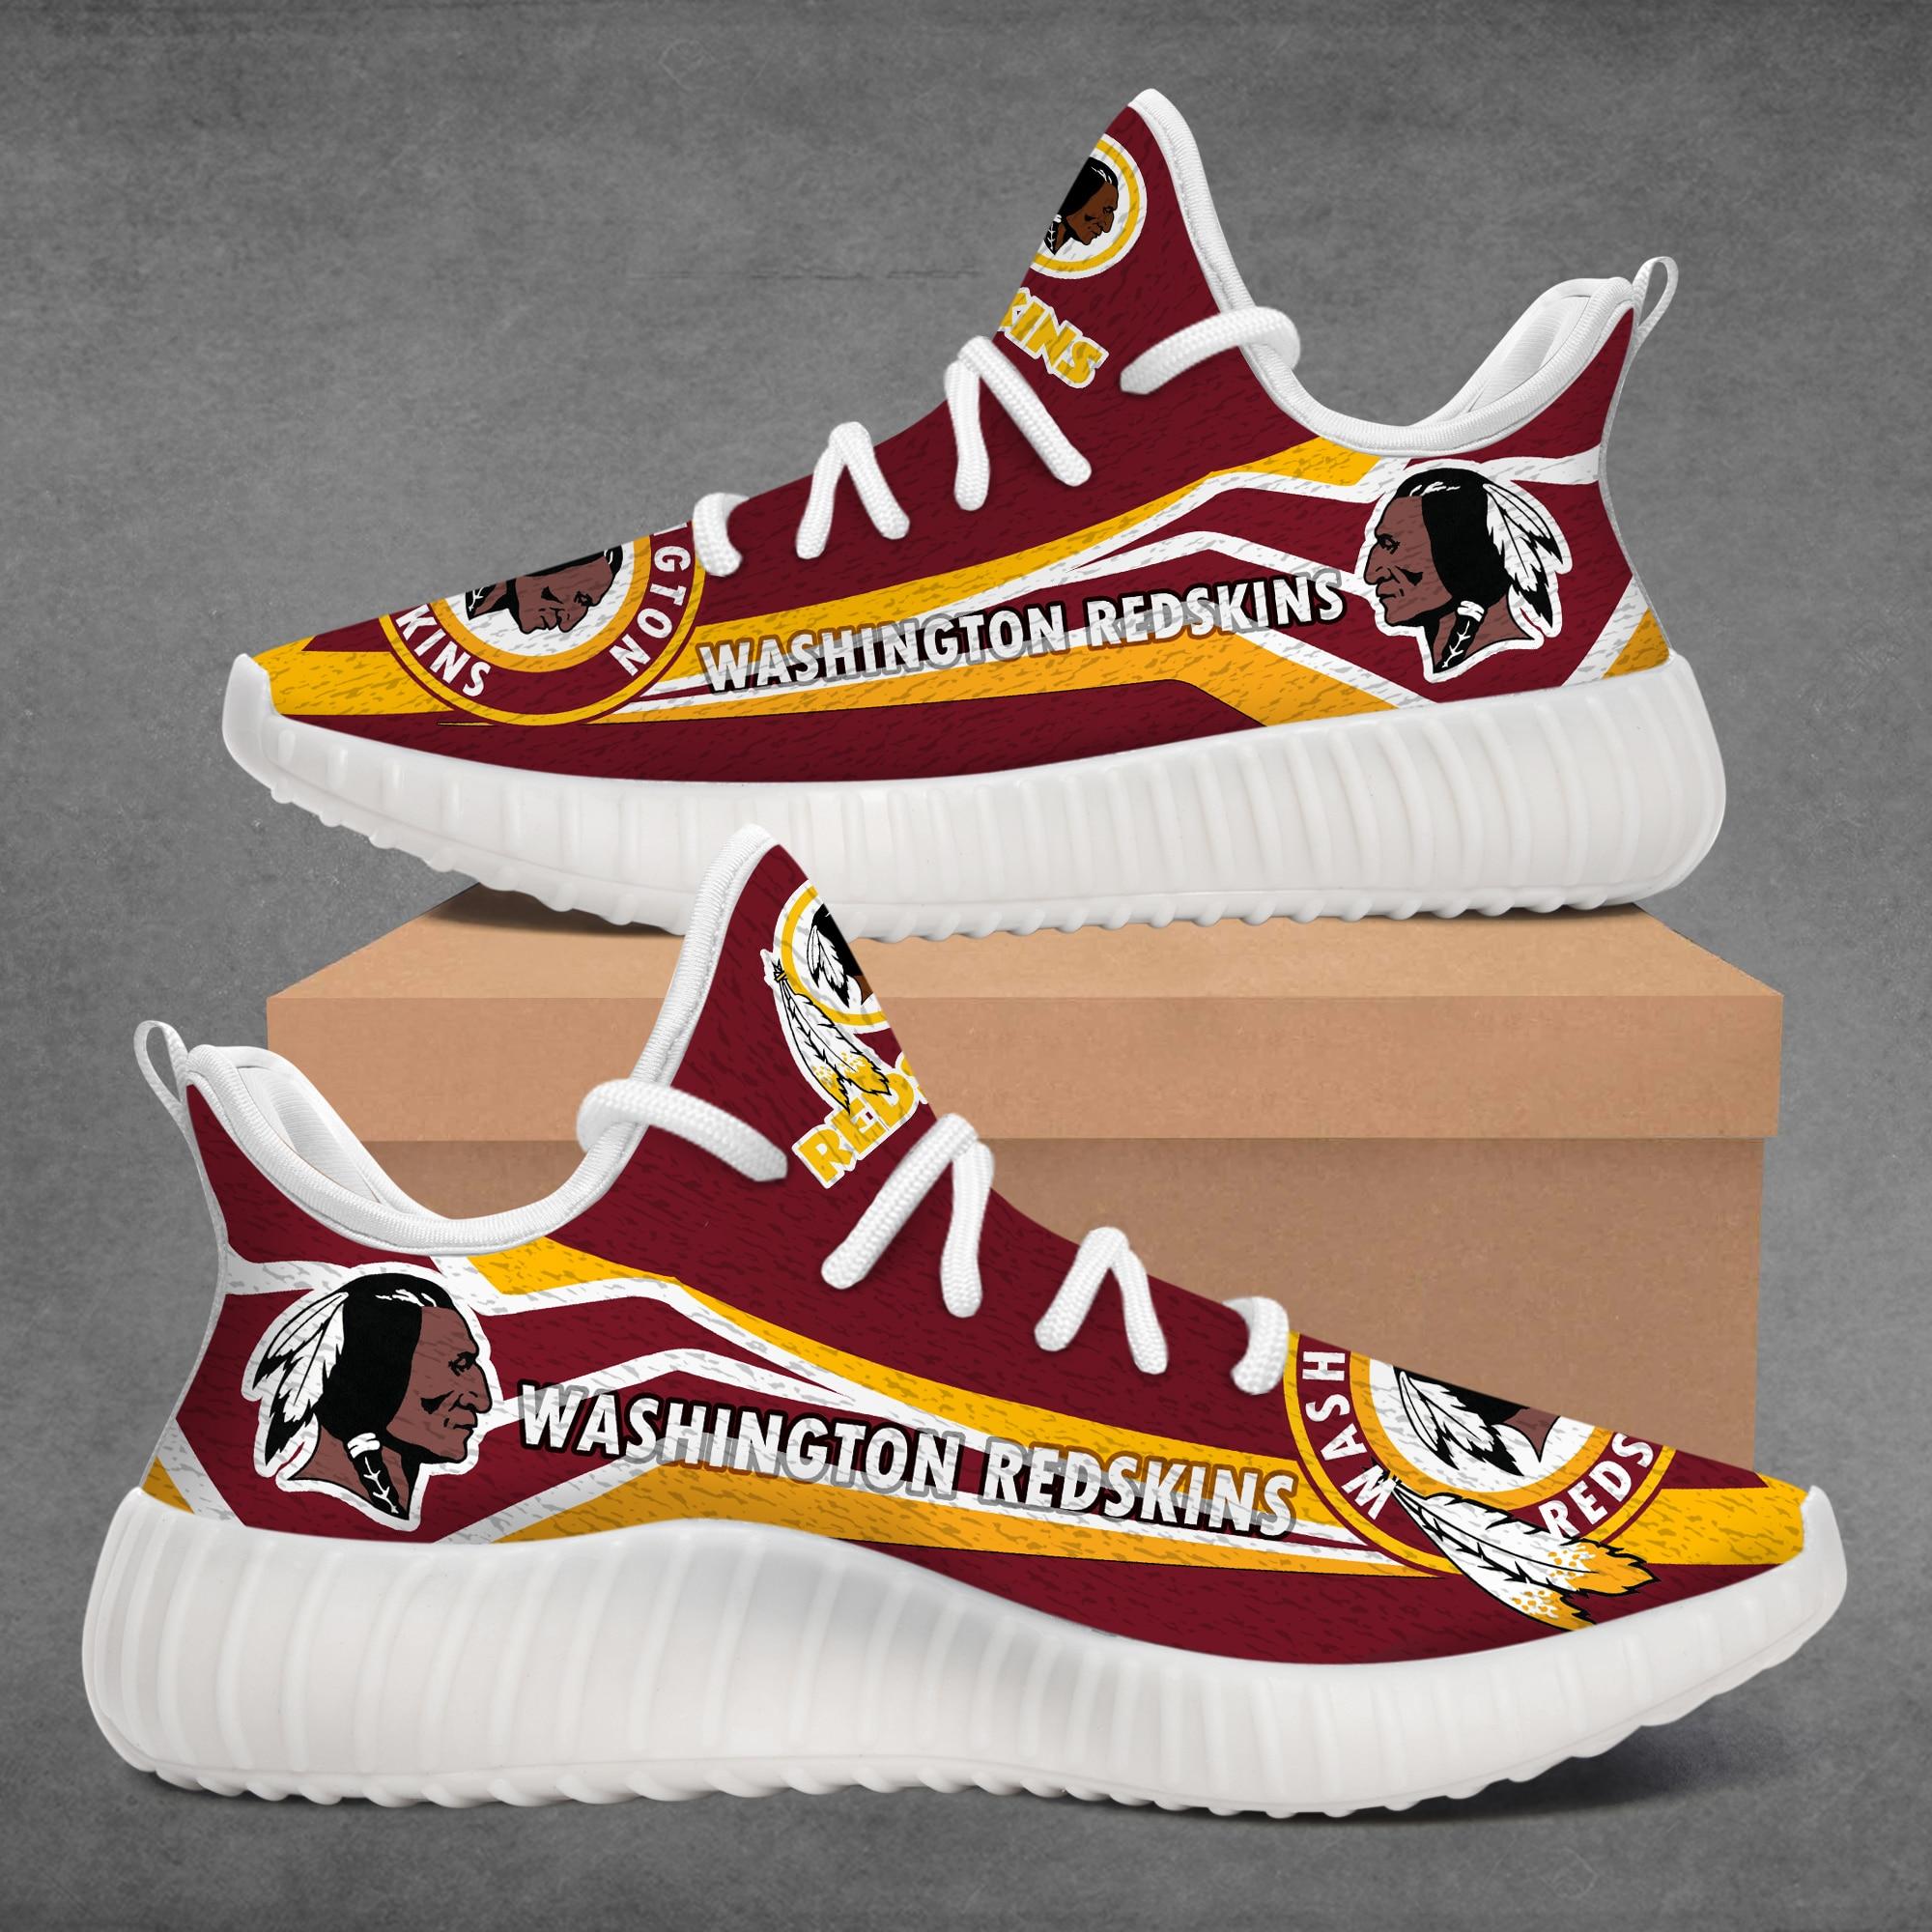 Children's Custom Rugby Team American Football Shoes Sneakers 3D Printing Men's Women's Shoes DIY 350